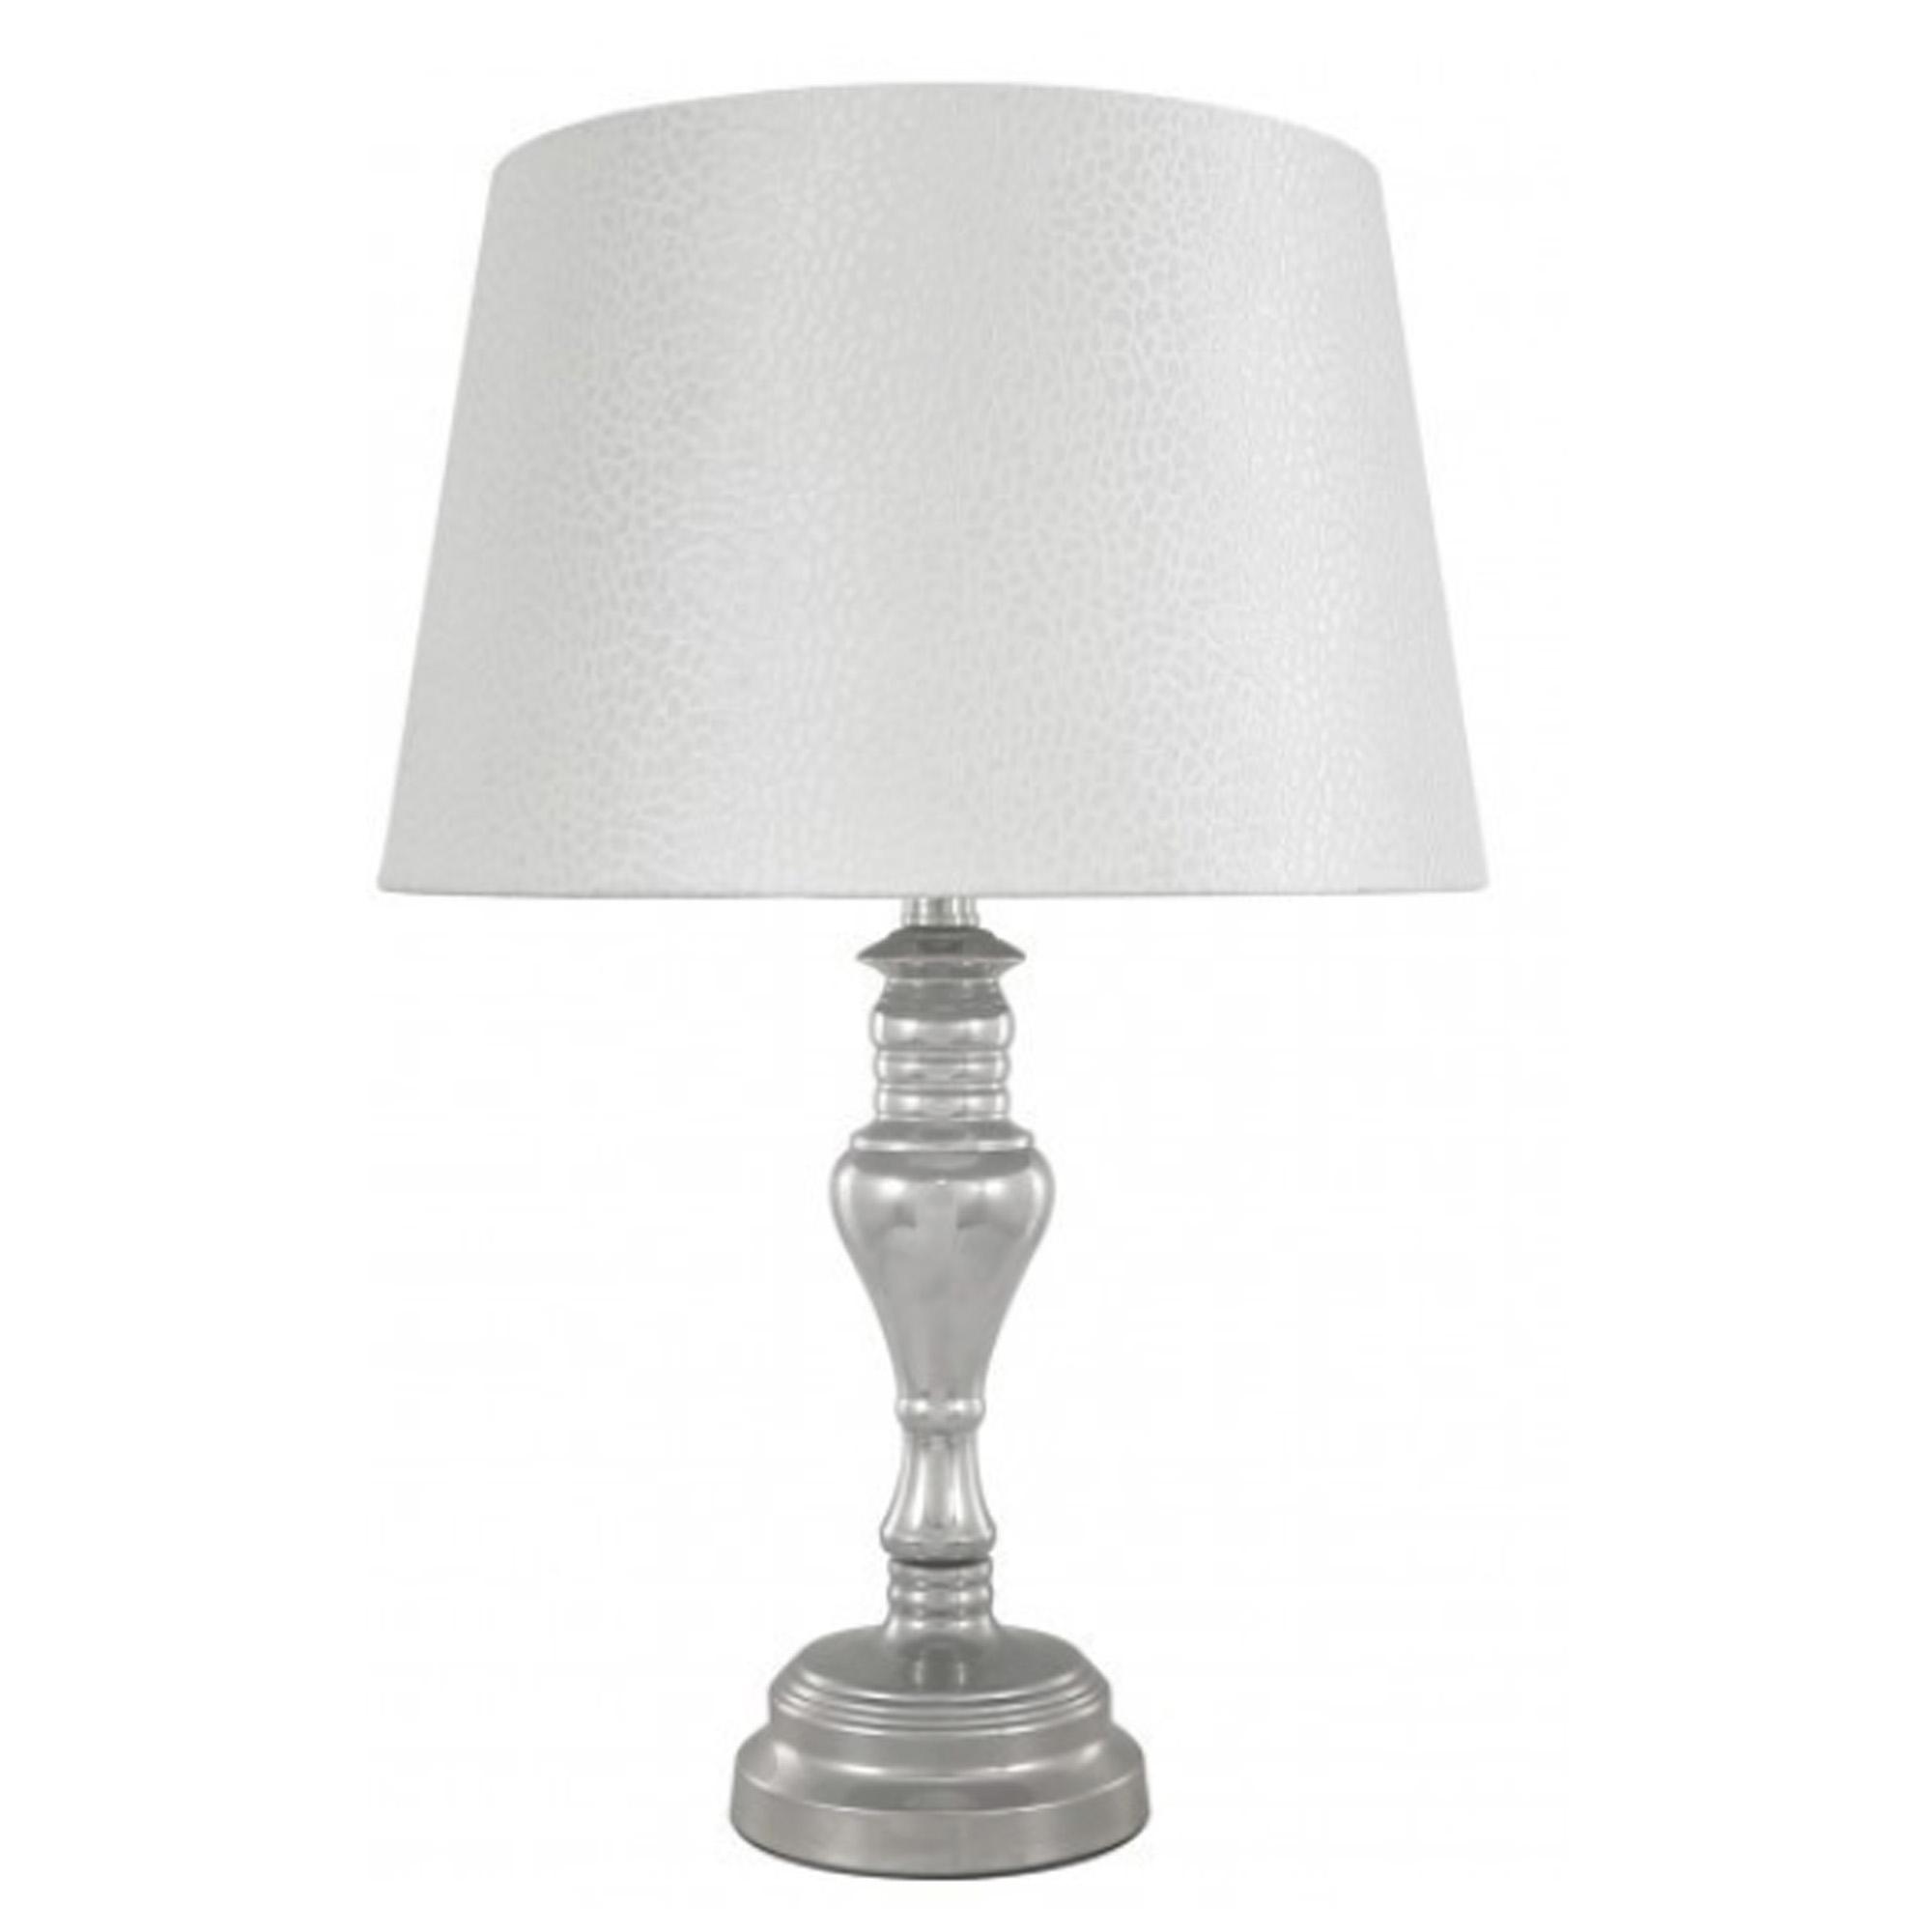 Chrome Modern Table Lamp